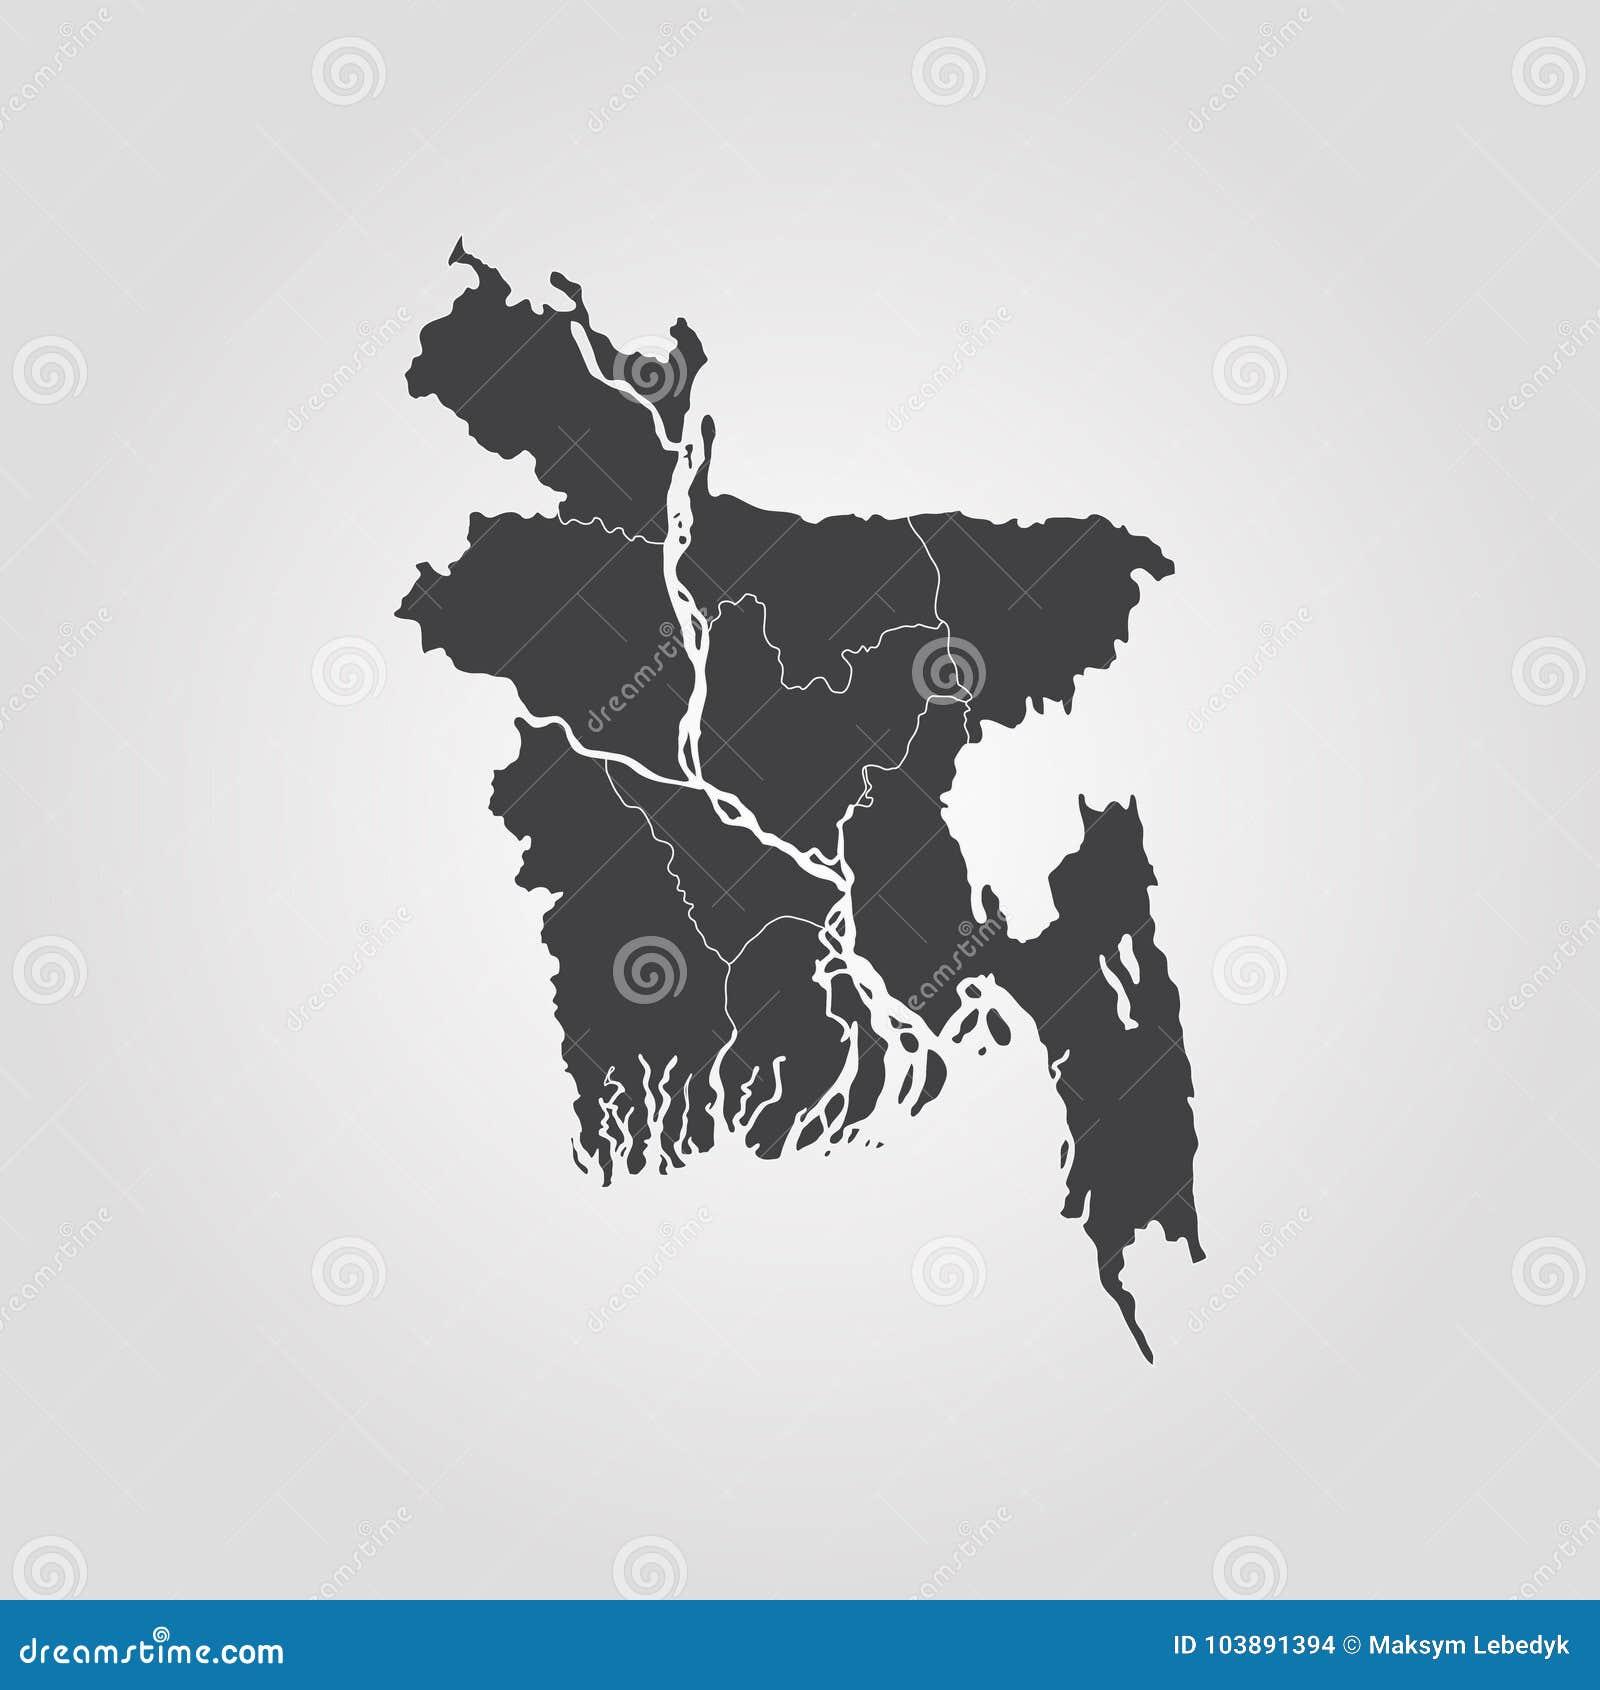 Map of bangladesh stock illustration illustration of dhaka 103891394 map of bangladesh vector illustration world map gumiabroncs Choice Image